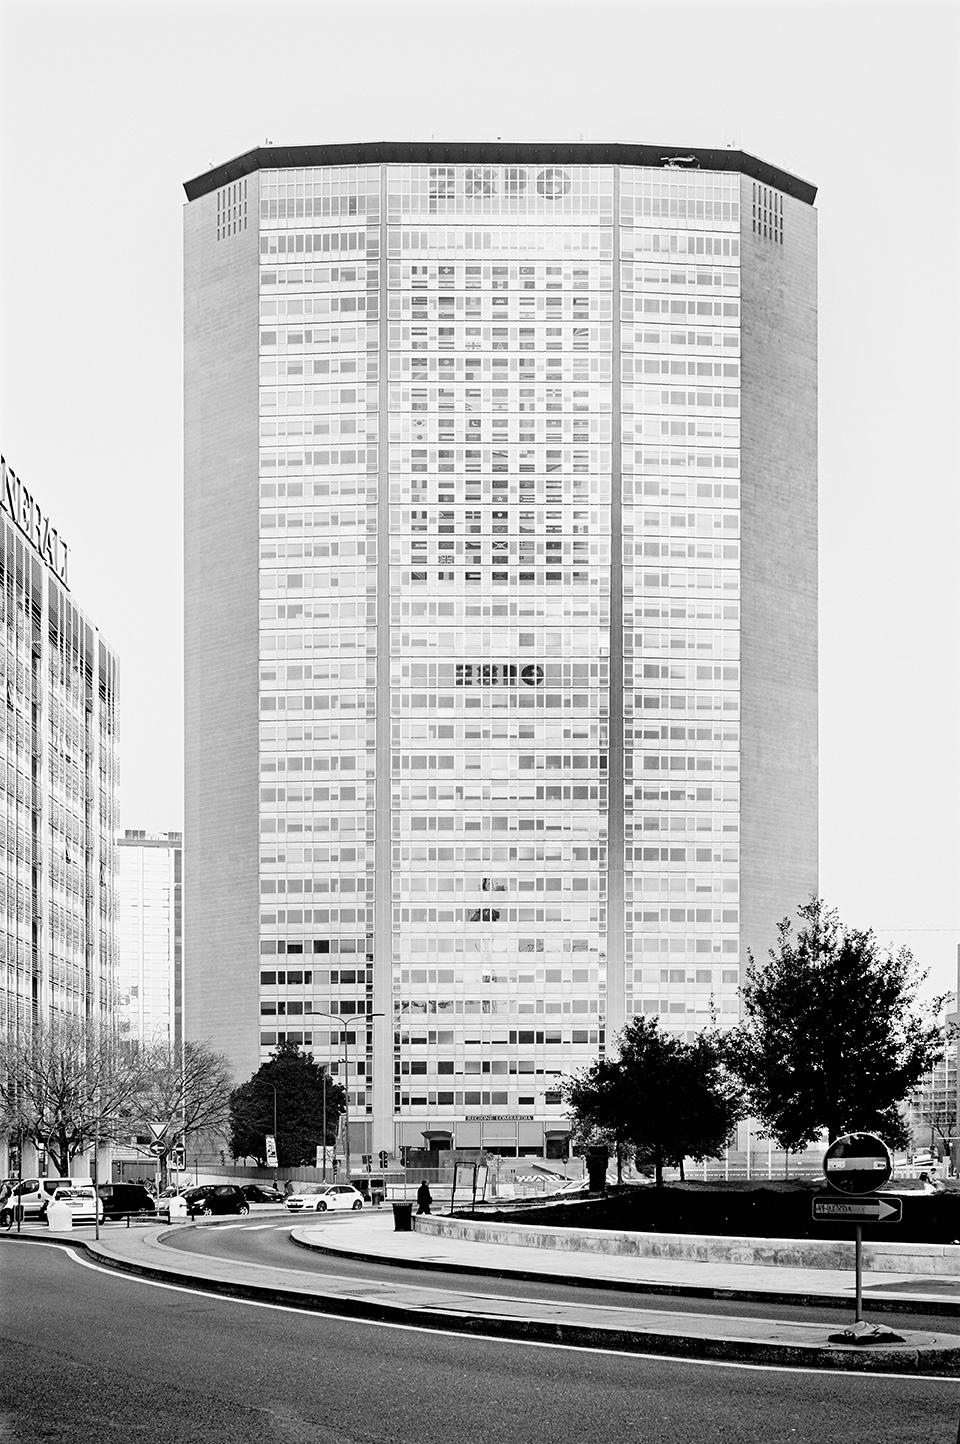 Gio Ponti e collaboratori, Torre Pirelli, Milano (1956-1960) © Daniele Zerbi